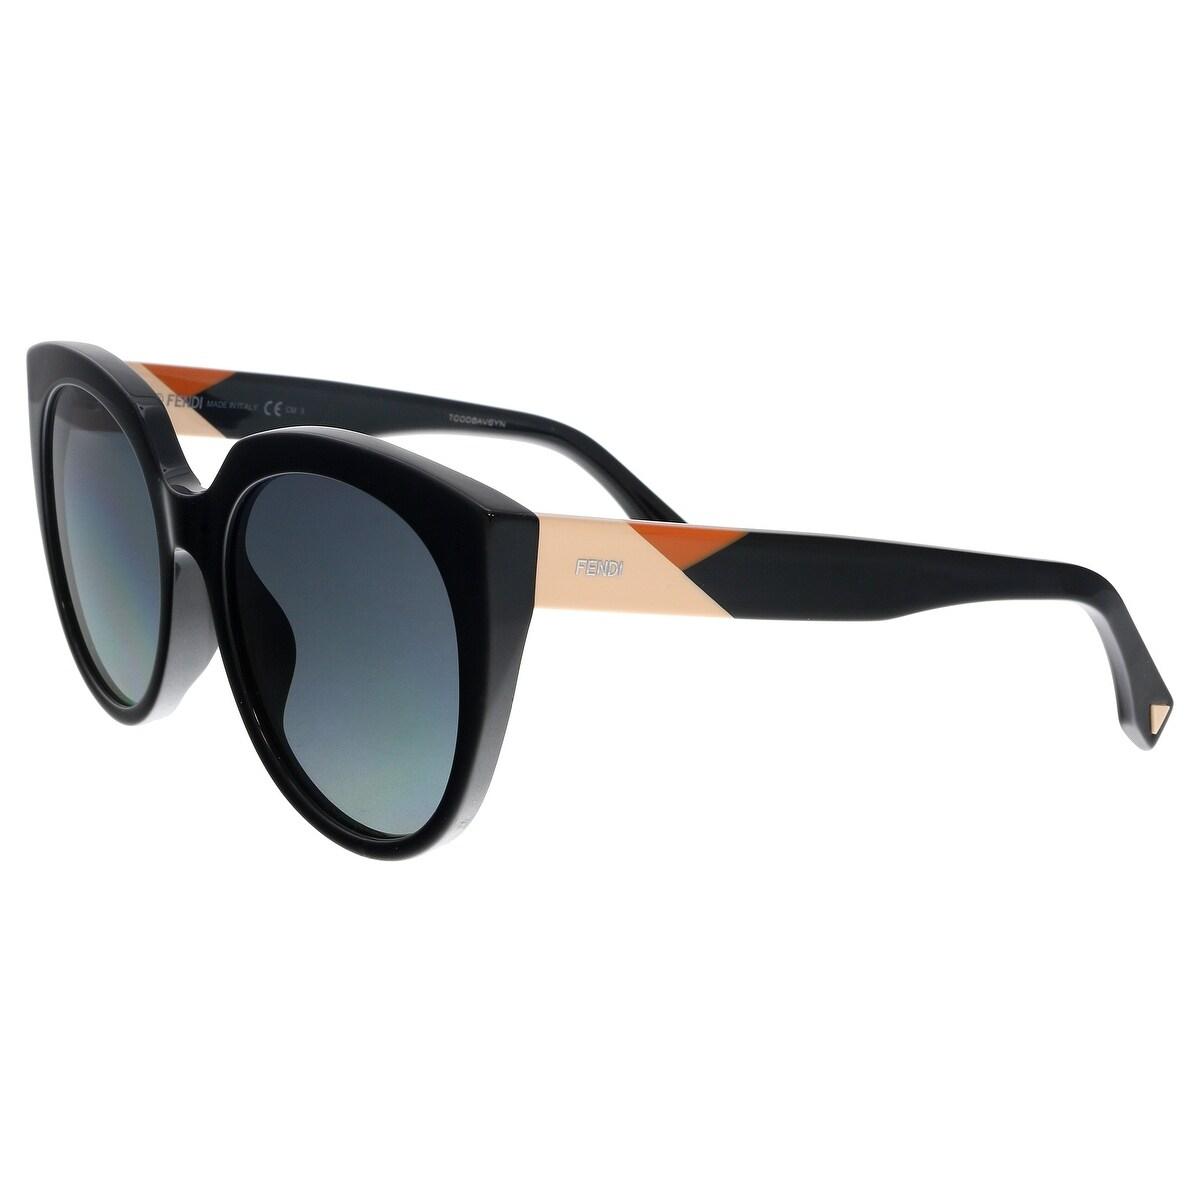 74358537786 Plastic Fendi Women s Sunglasses